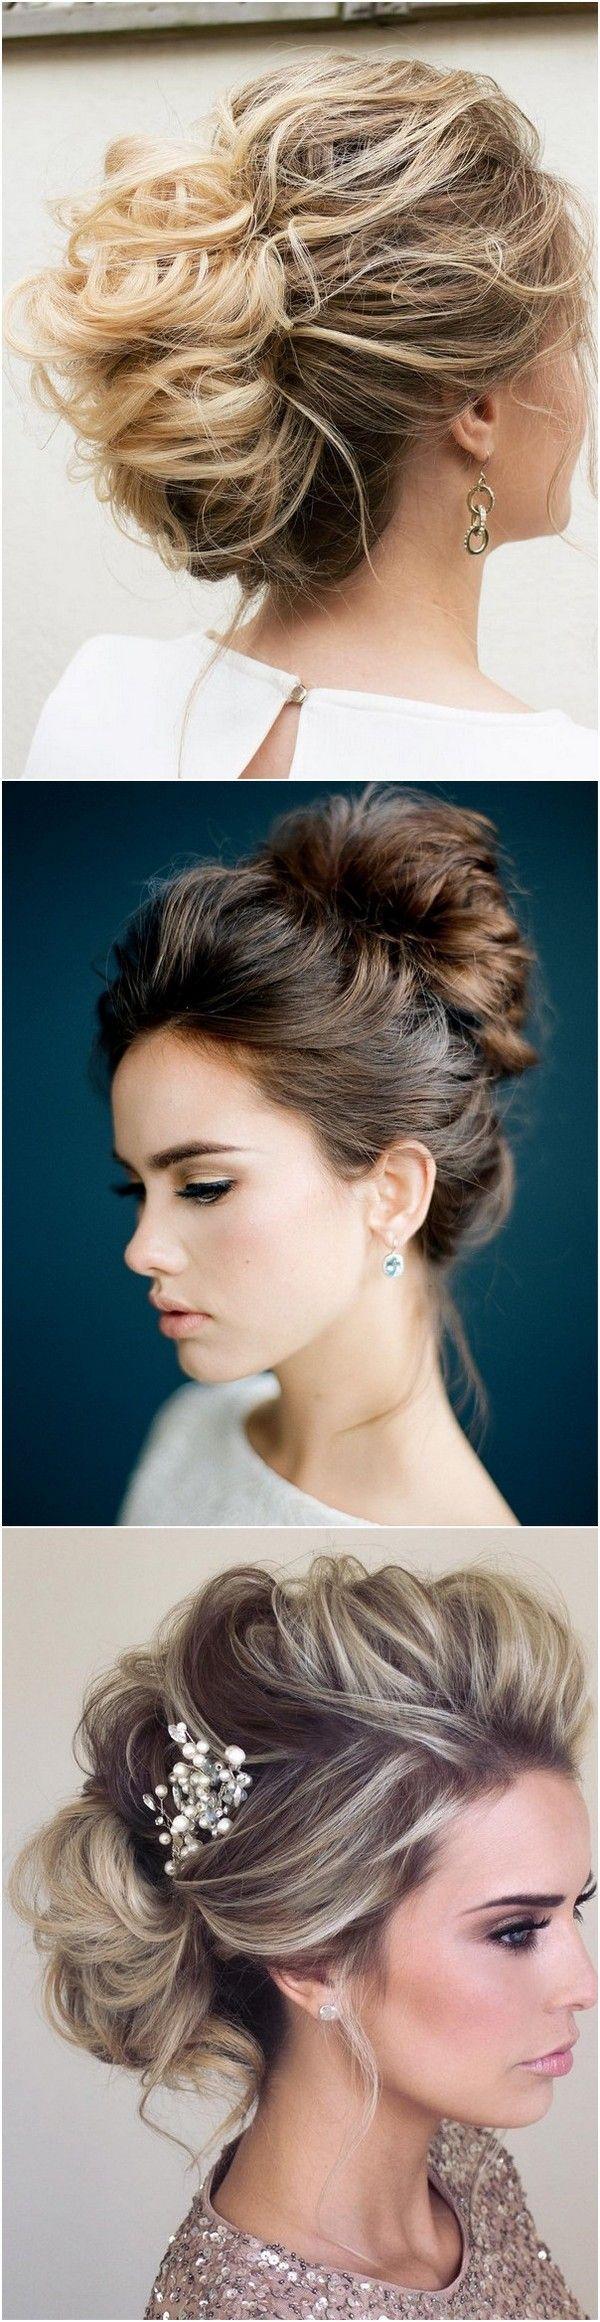 updo wedding hairstyles for 2018 by Steph 1 #bridalfashion #weddinghairstyle #updohairstyle #bridalhairstyles #weddingideas